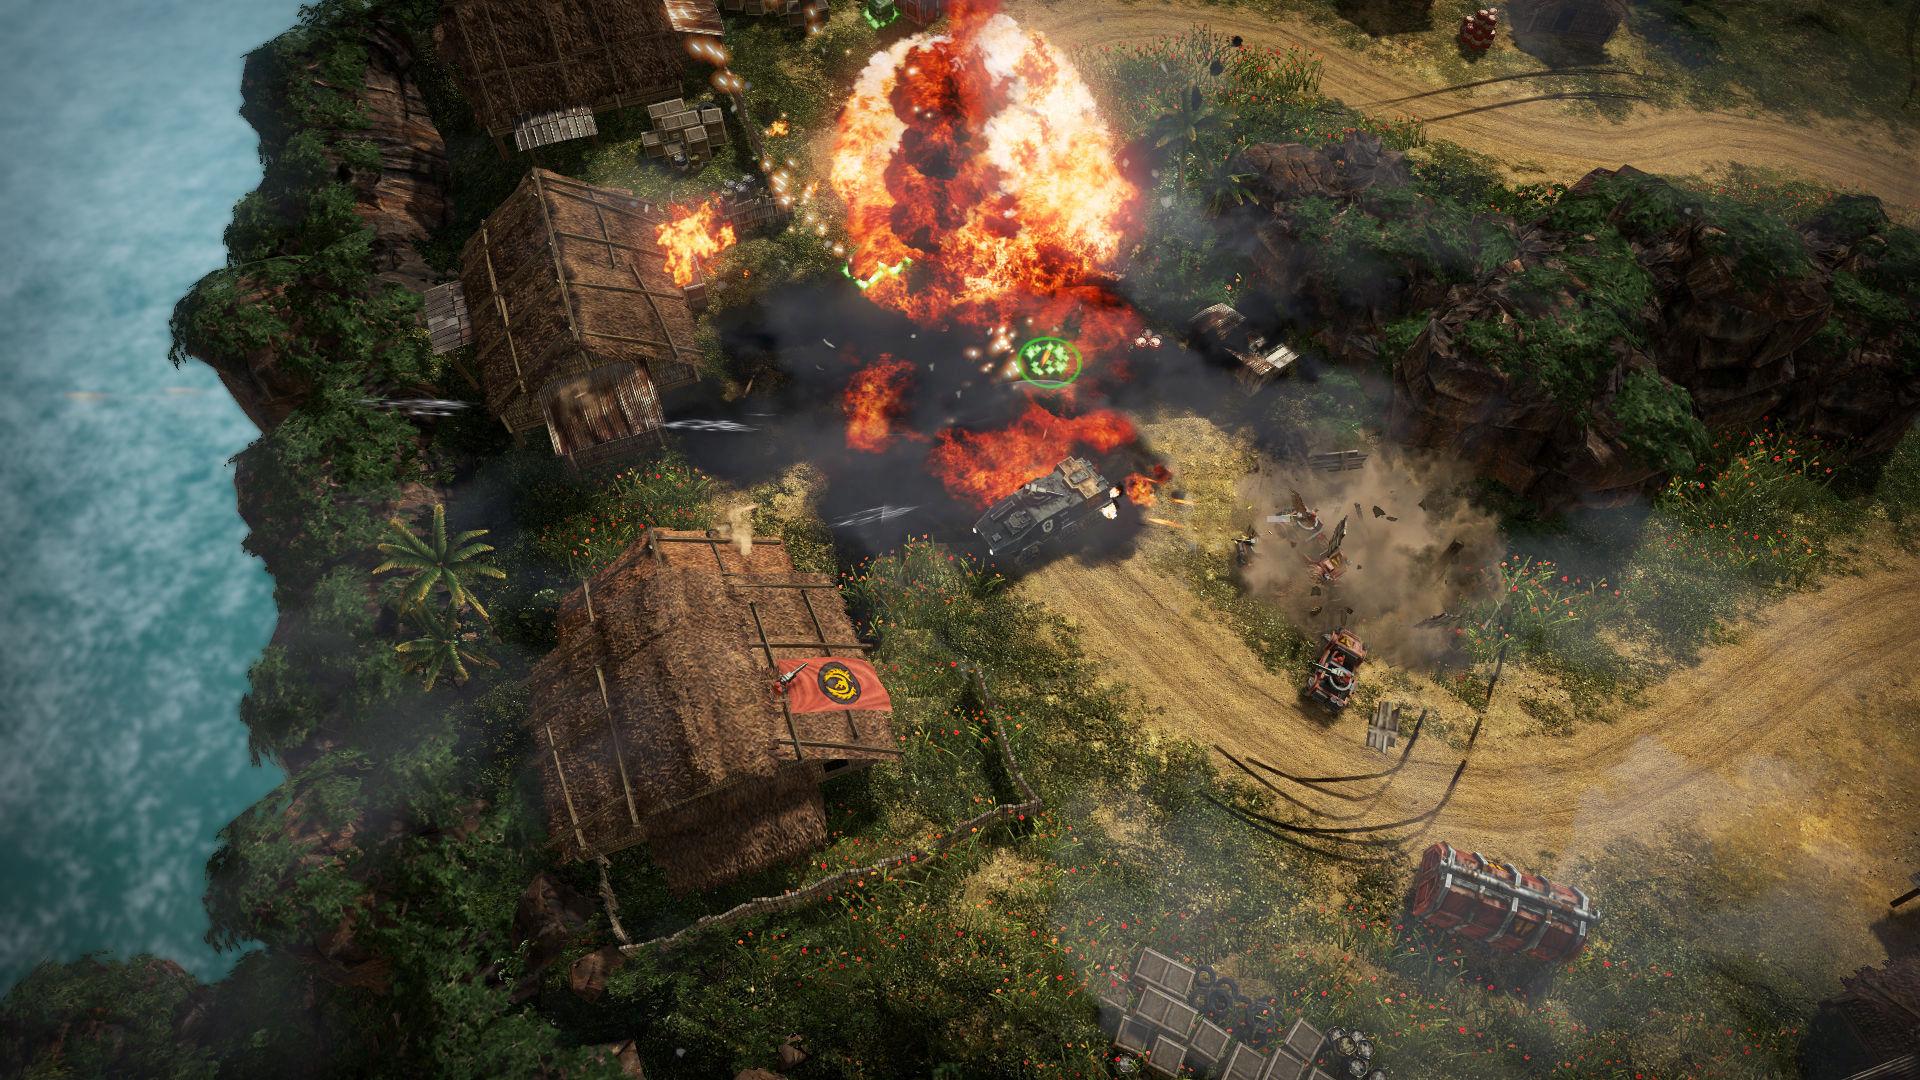 سی دی کی اریجینال استیم بازی Renegade Ops - Collection